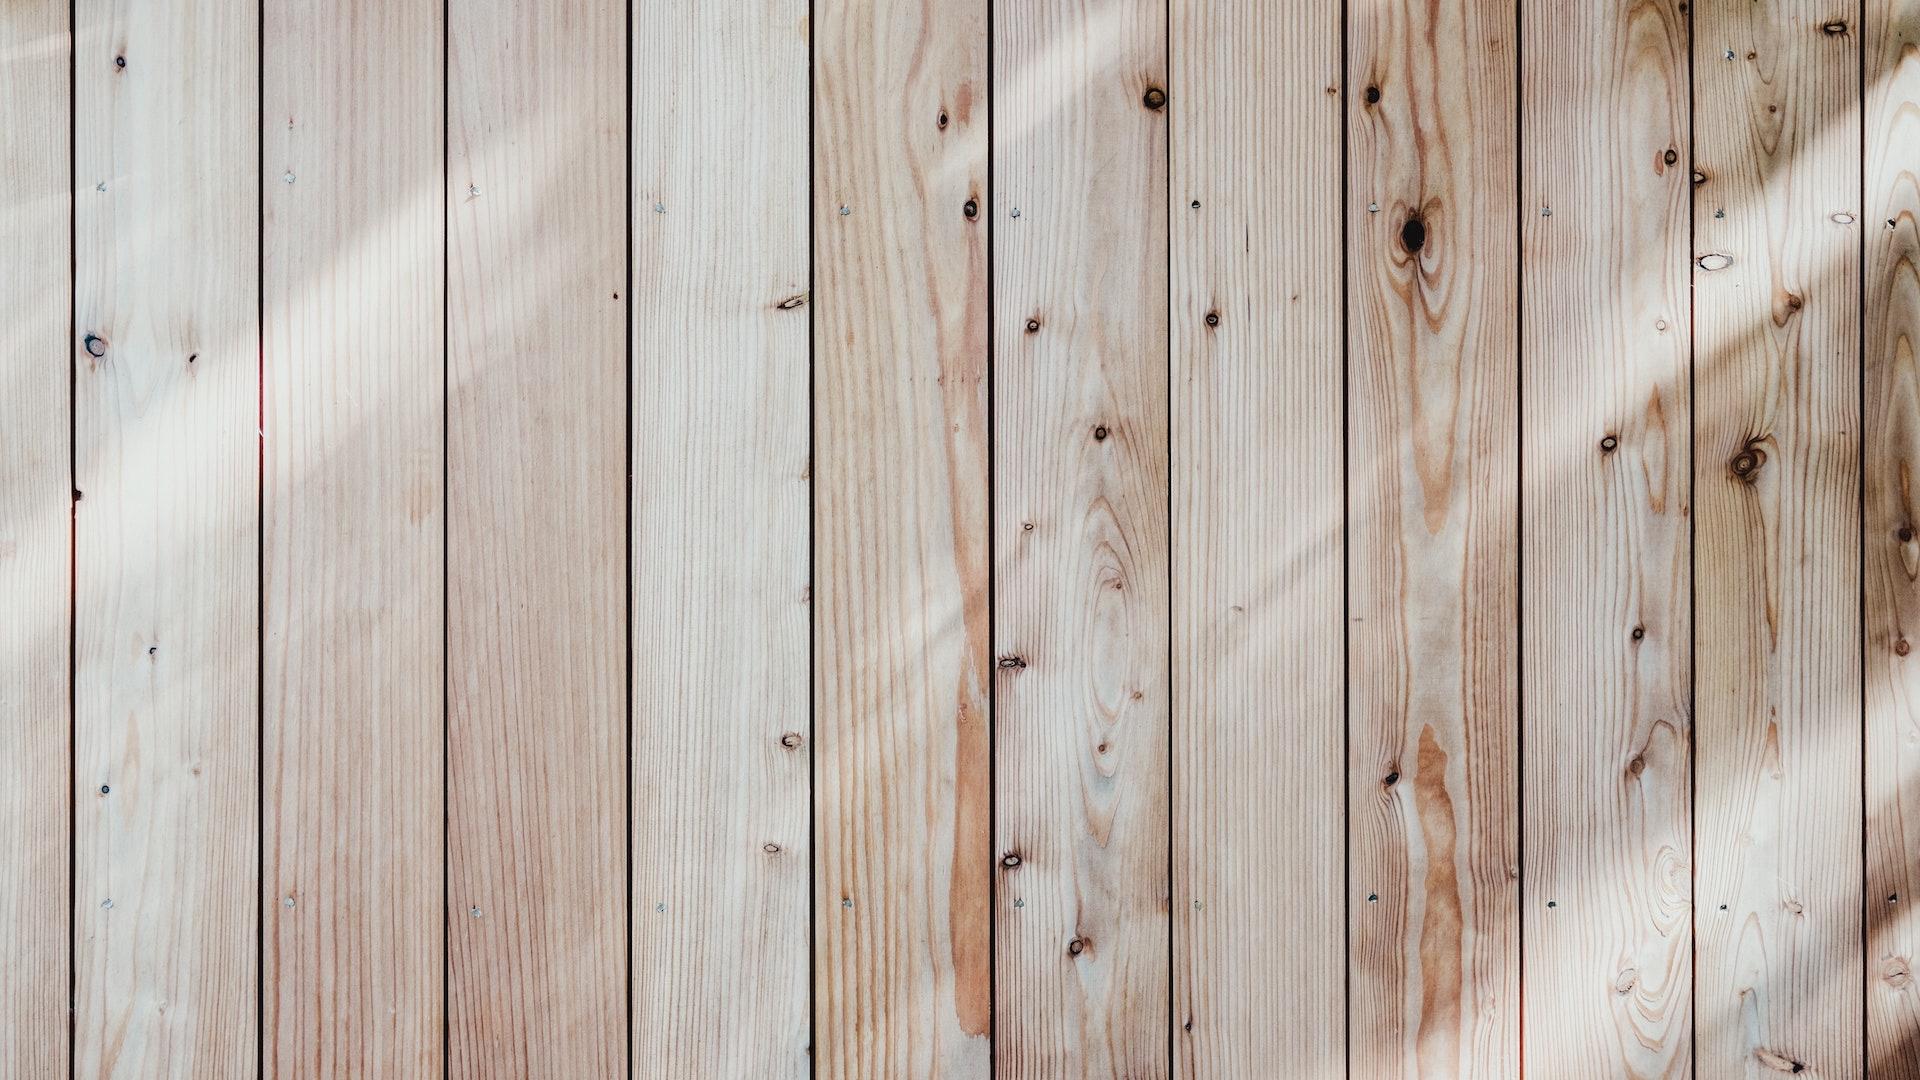 Zoomの打ち合わせやリモートワークに使える無料のバーチャル背景素材 木製の壁 バーチャル背景のフリー素材集 V背景